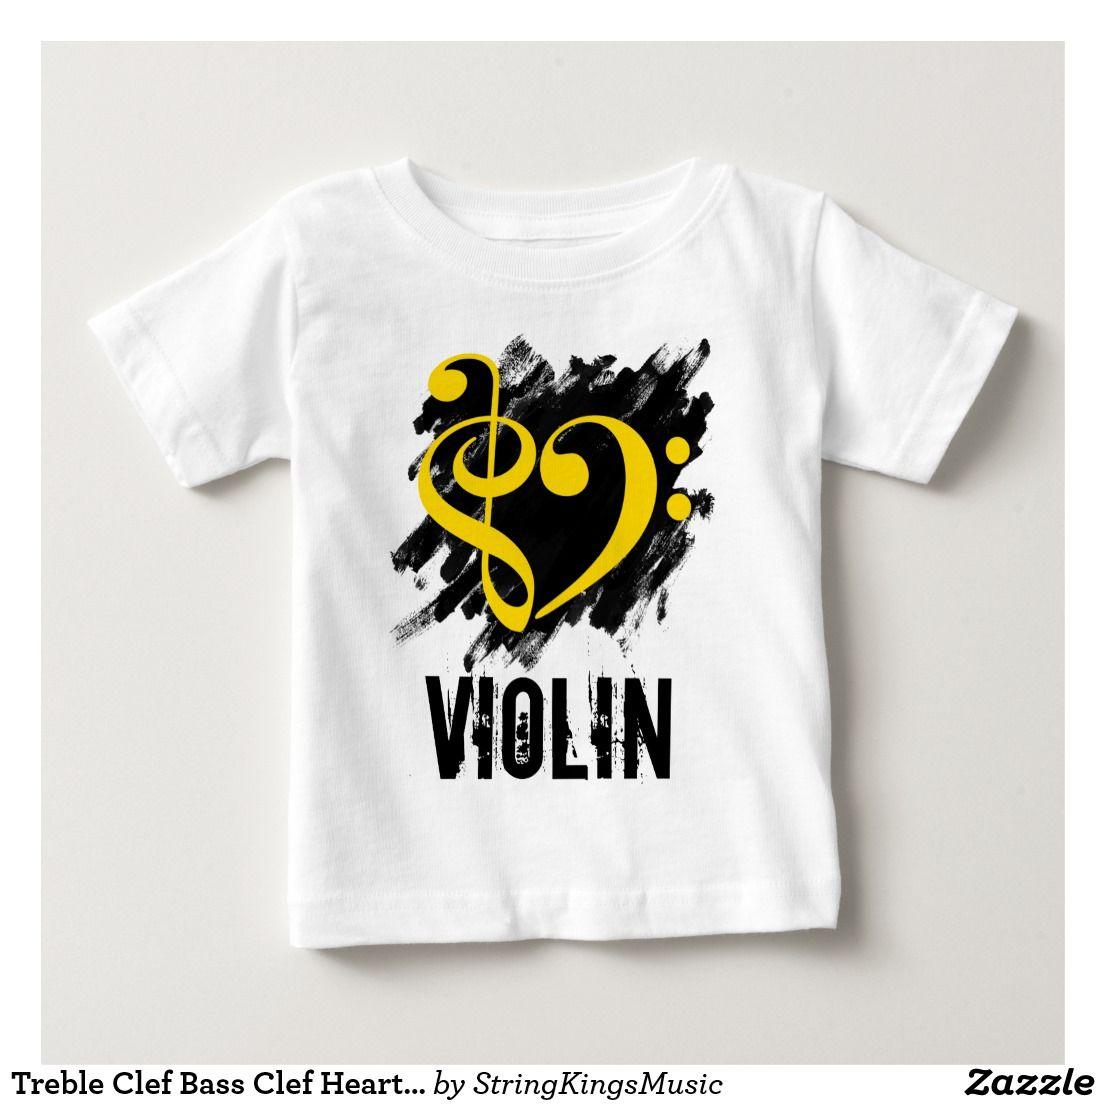 Treble Clef Bass Clef Heart Grunge Violin Baby T-Shirt